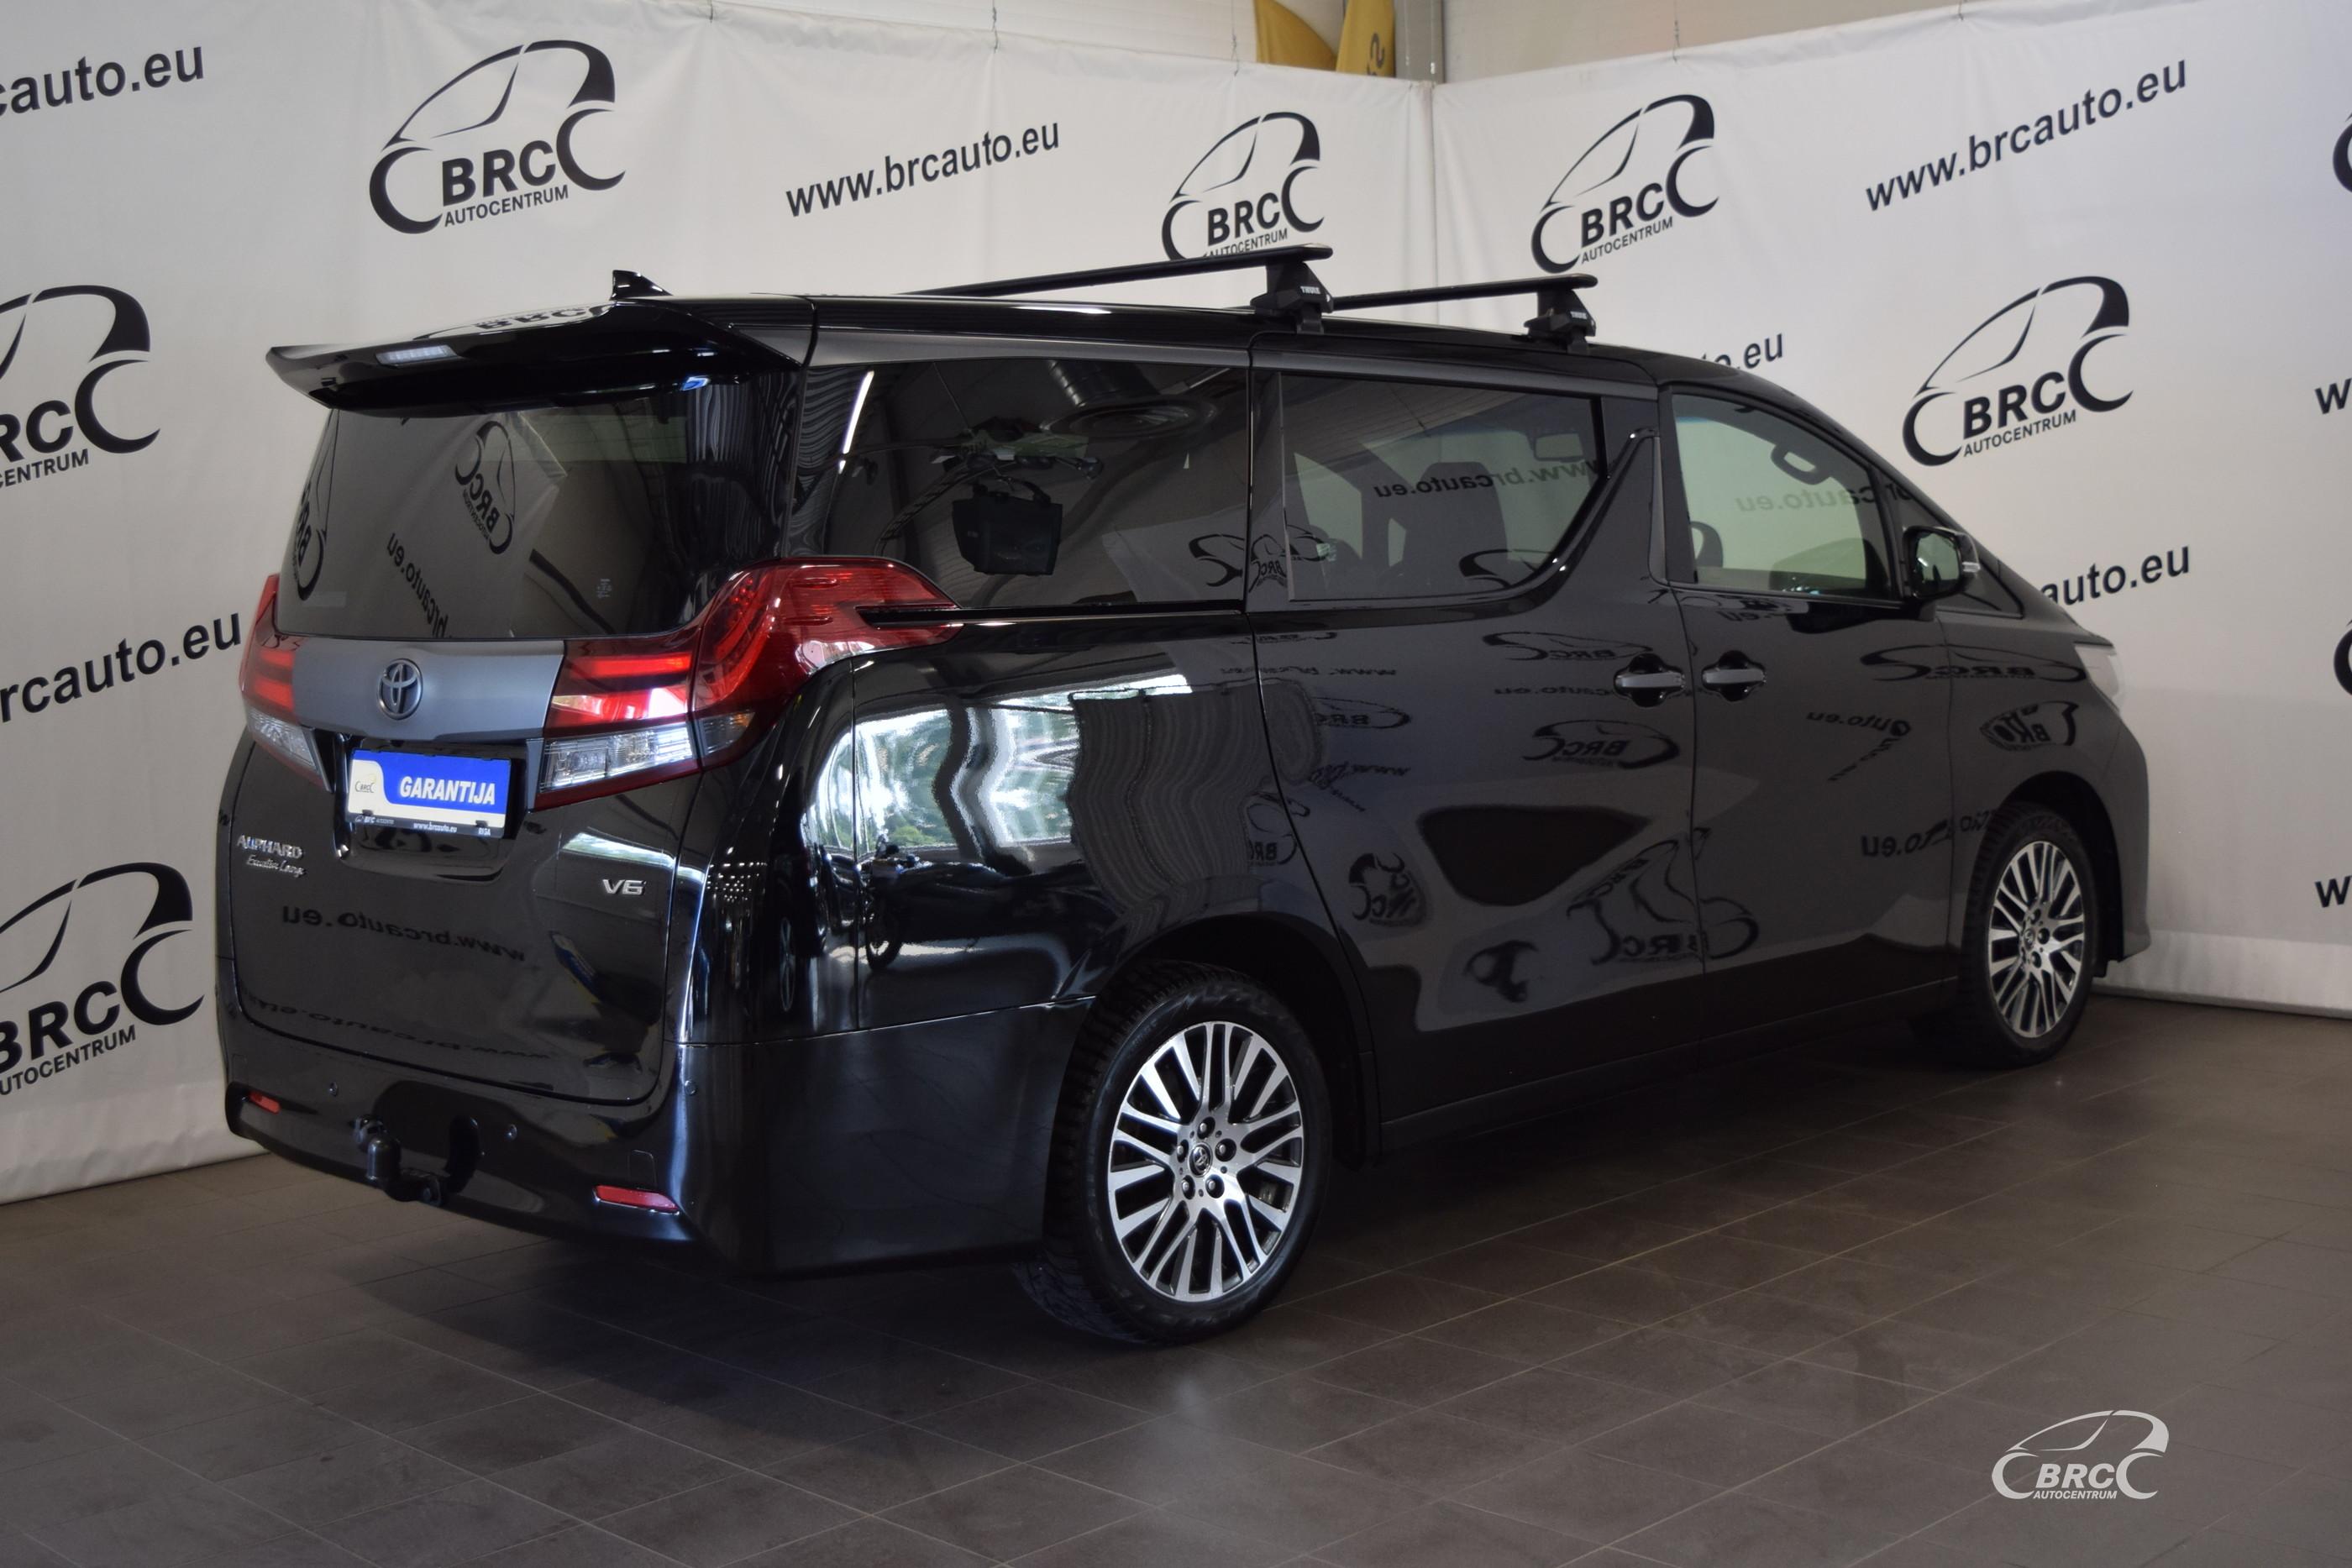 Toyota Alphard Executive Lounge V6 6 seats